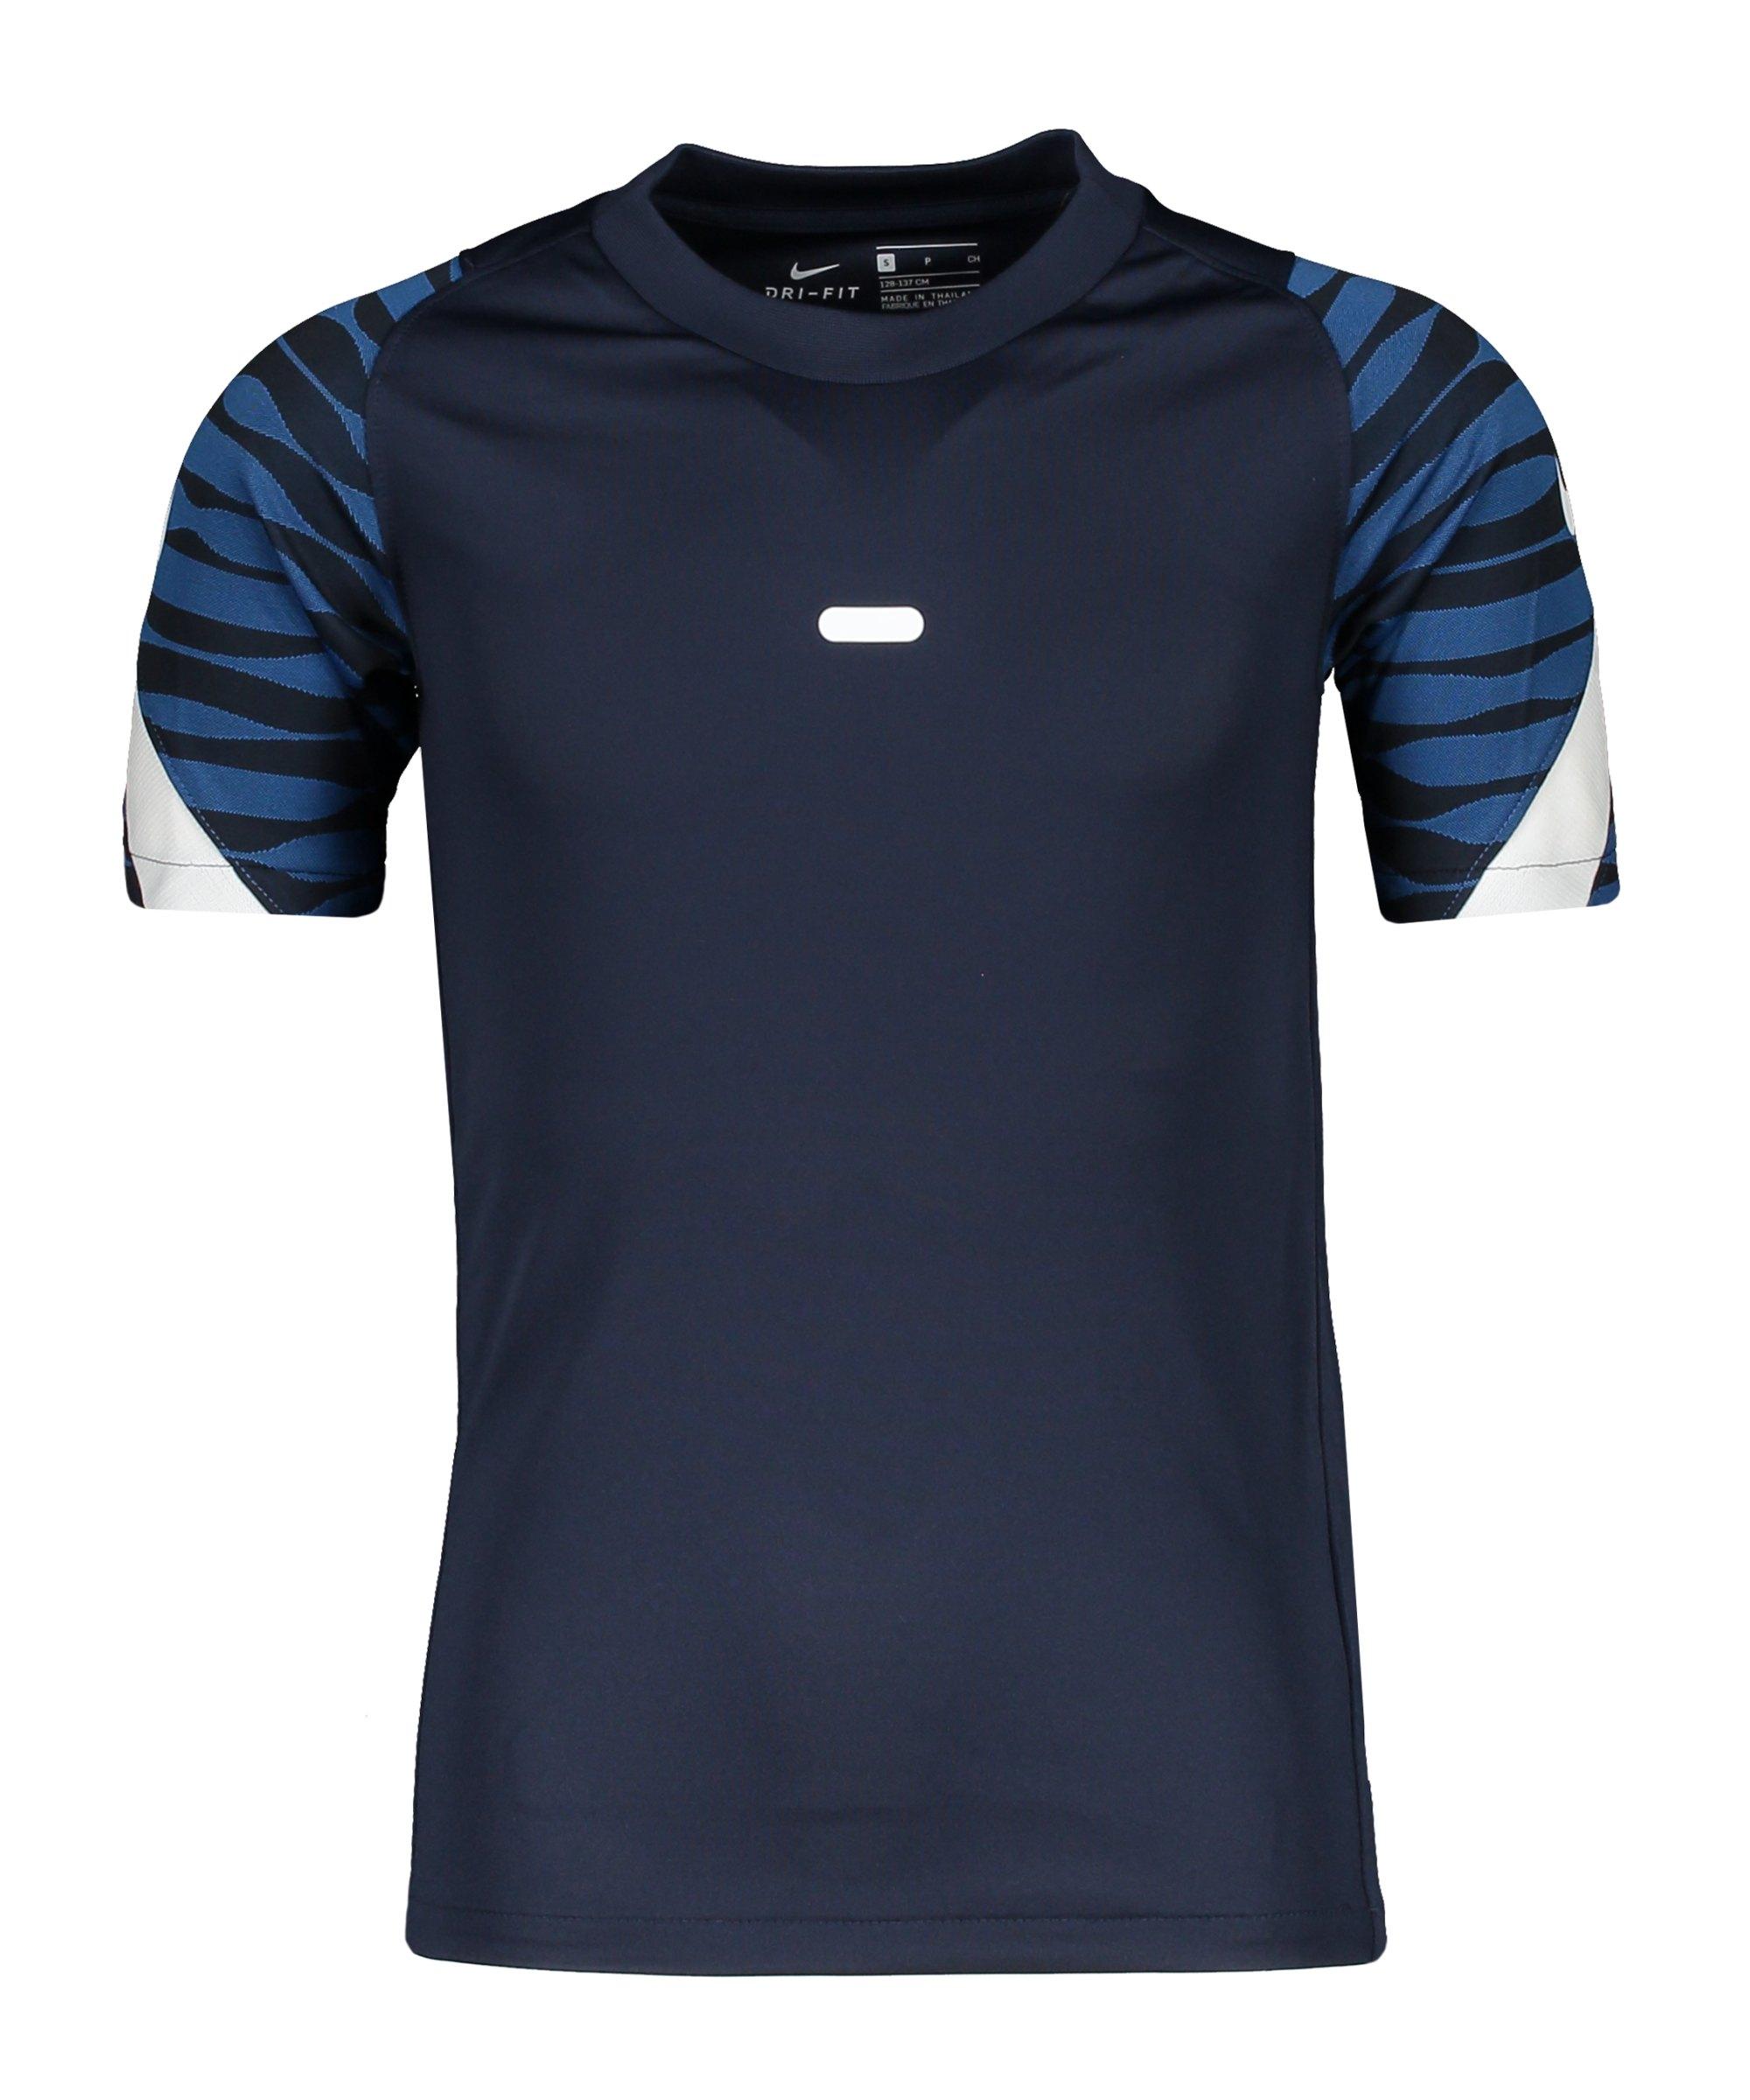 Nike Strike 21 T-Shirt Kids Blau Weiss F451 - blau